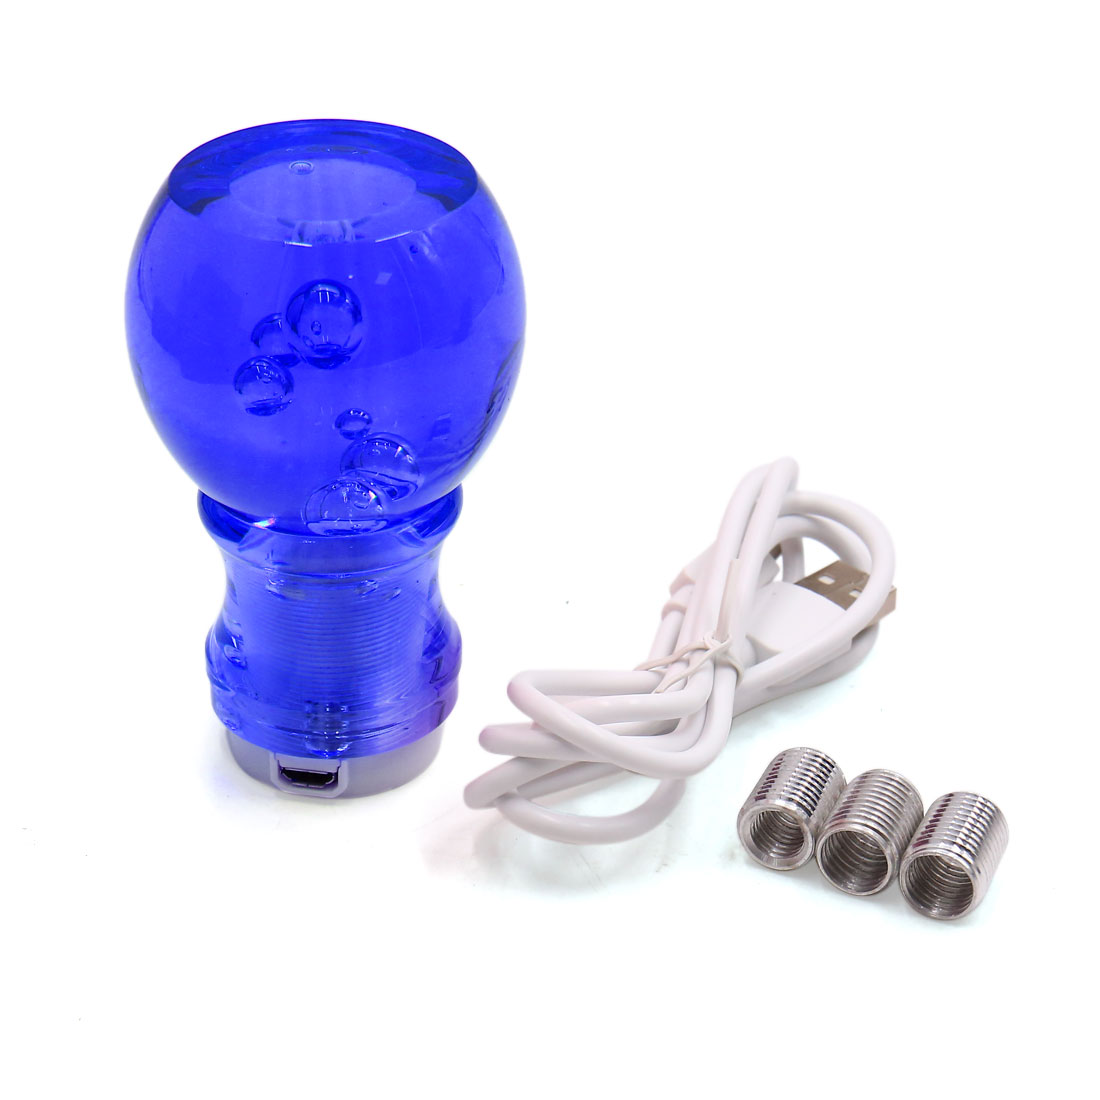 Faux Crystal Bubble Blue LED Light Manual Shift Knob Shifter Gear Lever for Car